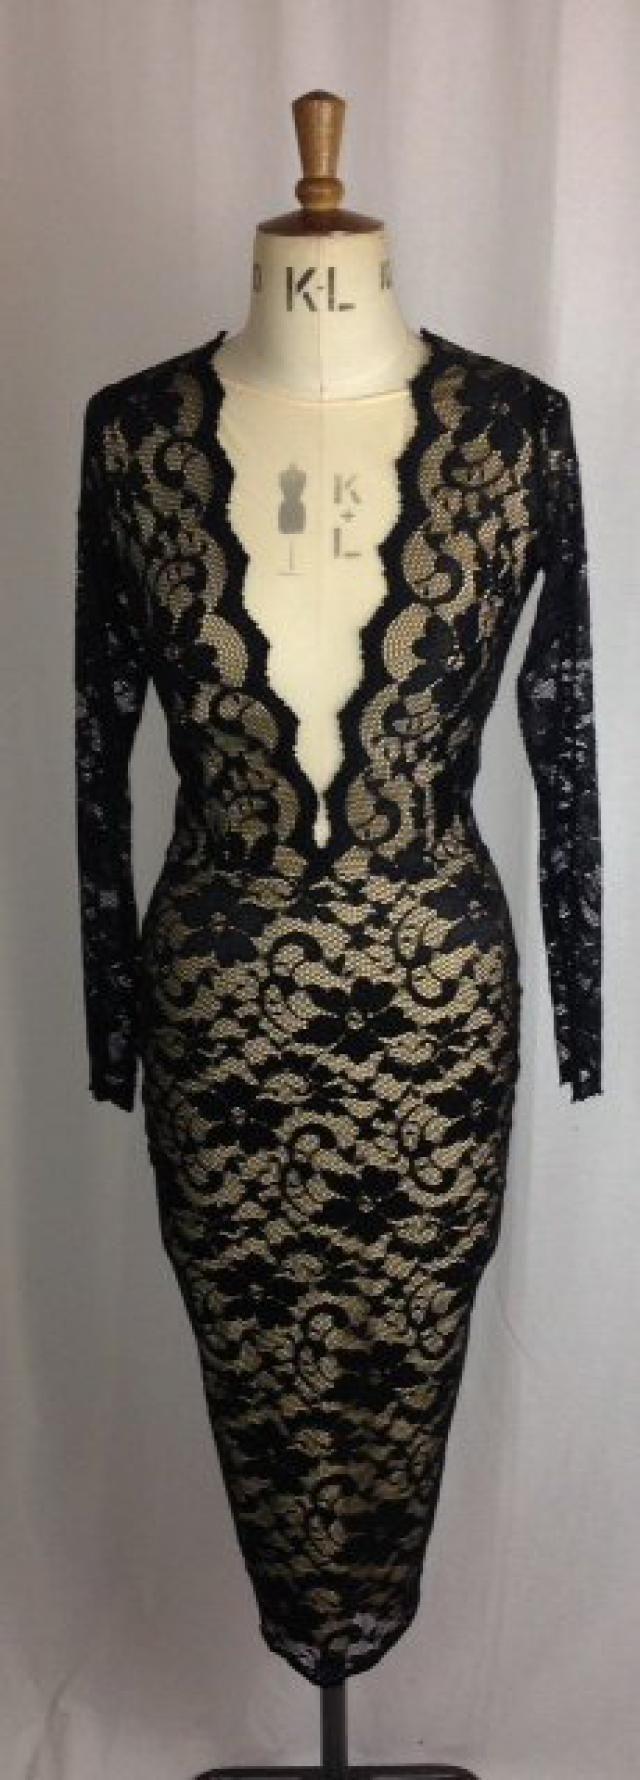 17289e1162 Baylis   Knight Black Nude Lace PLUNGE Long Sleeve Low Cut Wiggle FISHTAIL  FRILL Knee Dress